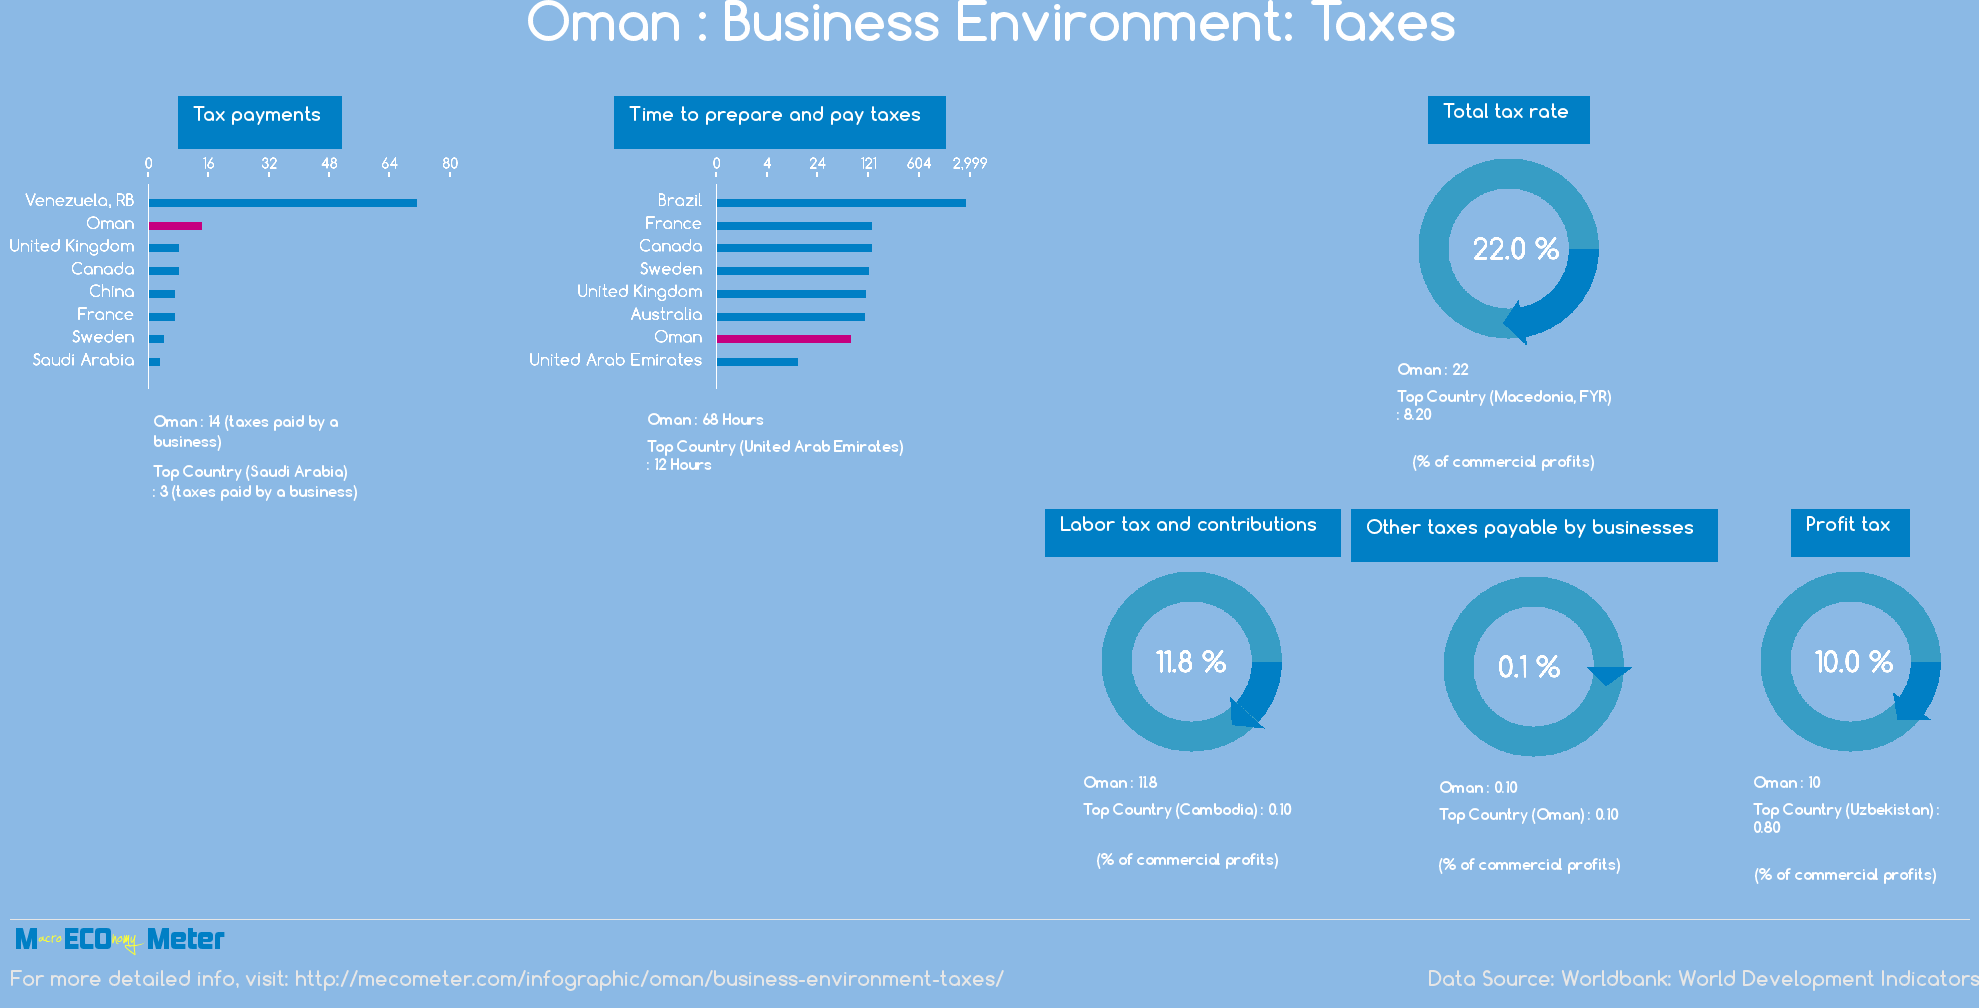 Oman : Business Environment: Taxes